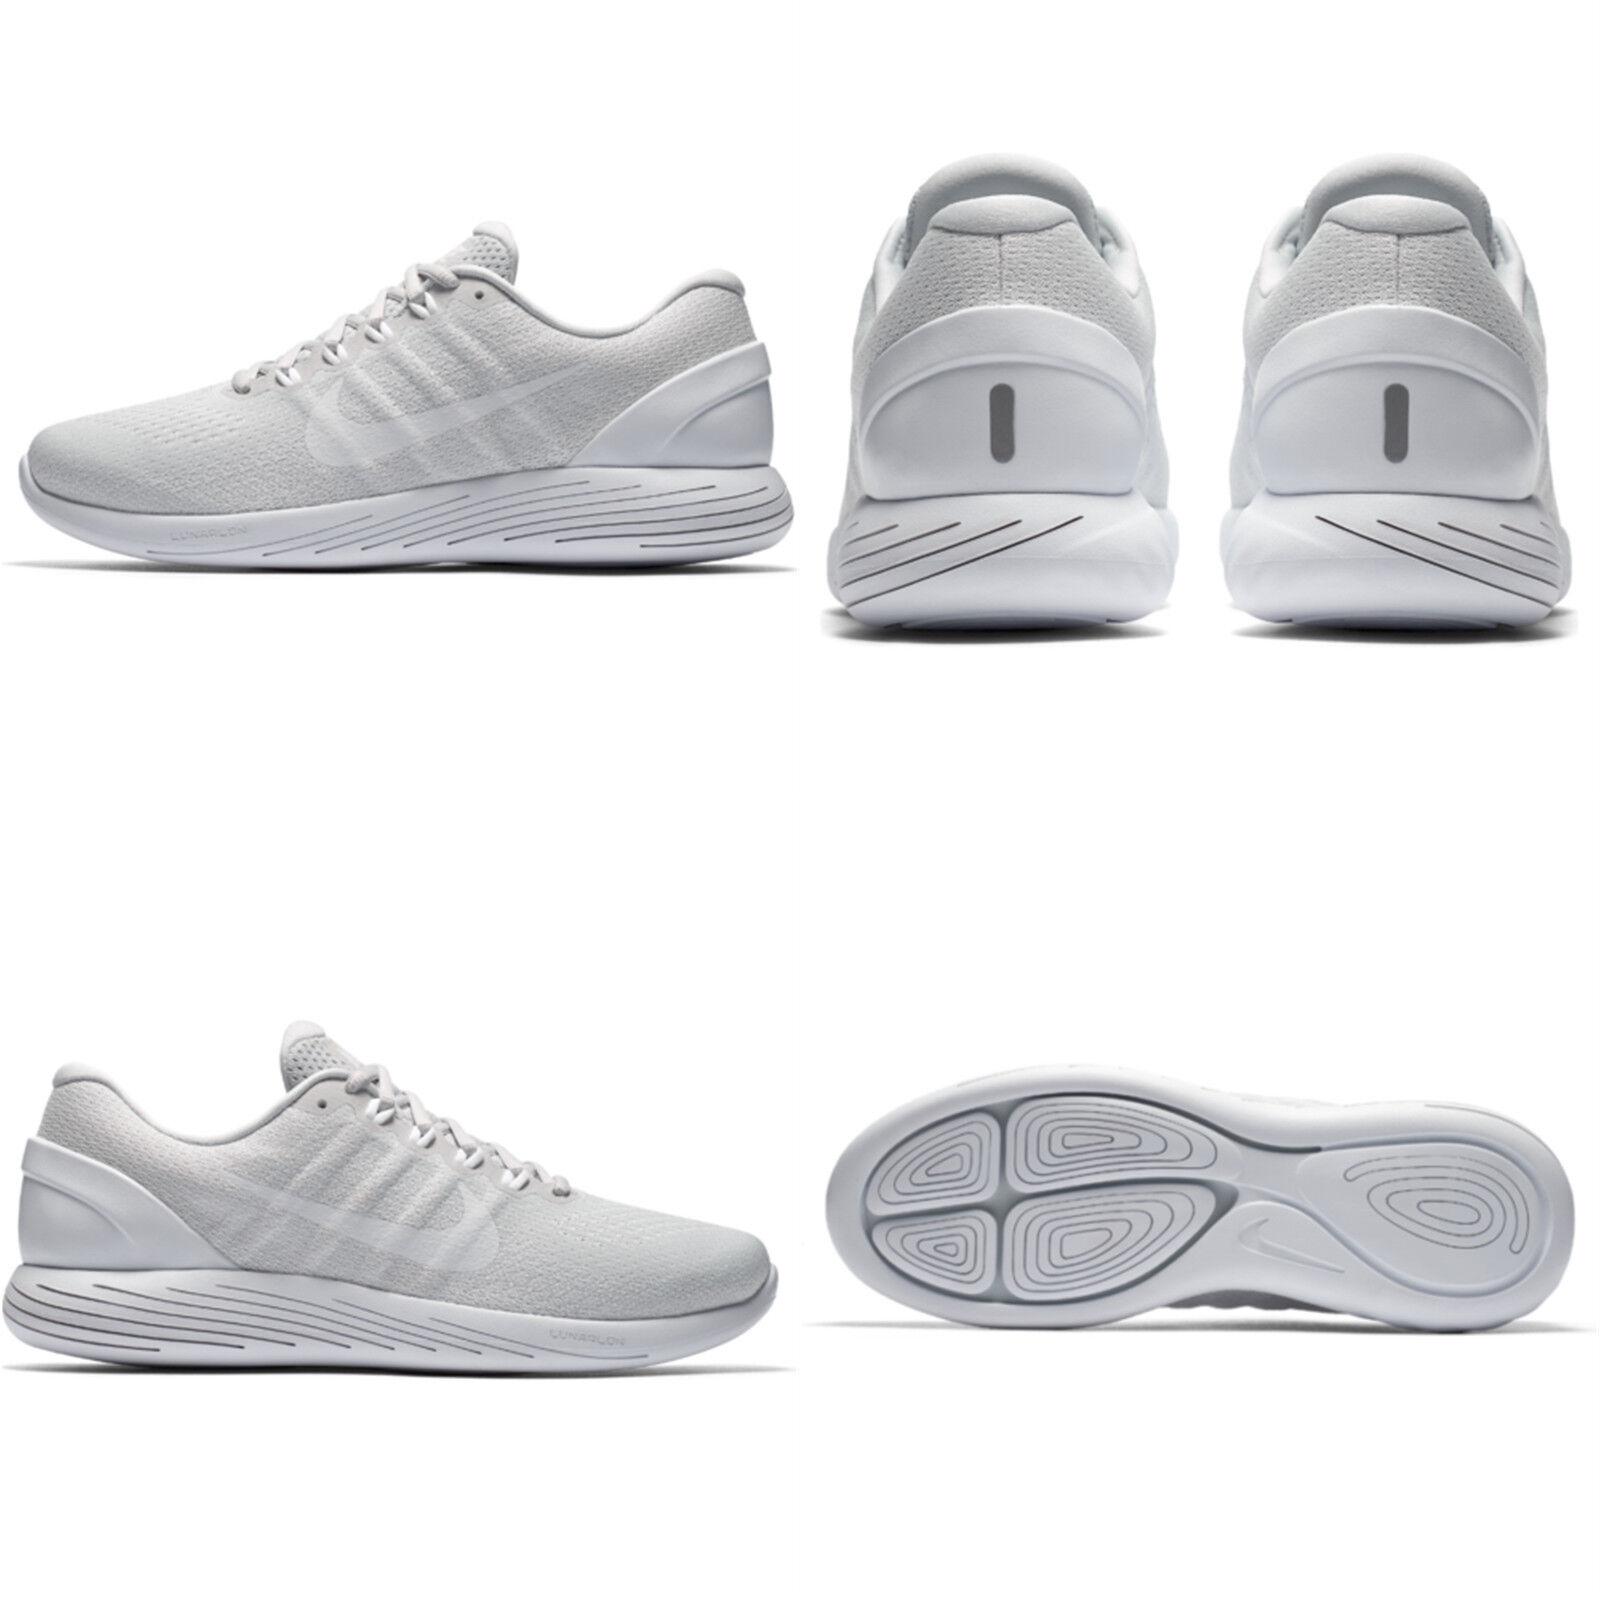 5193a224866d Nike Lunarglide 9 Mens 904715-003 Platinum White Knit Running Shoes ...